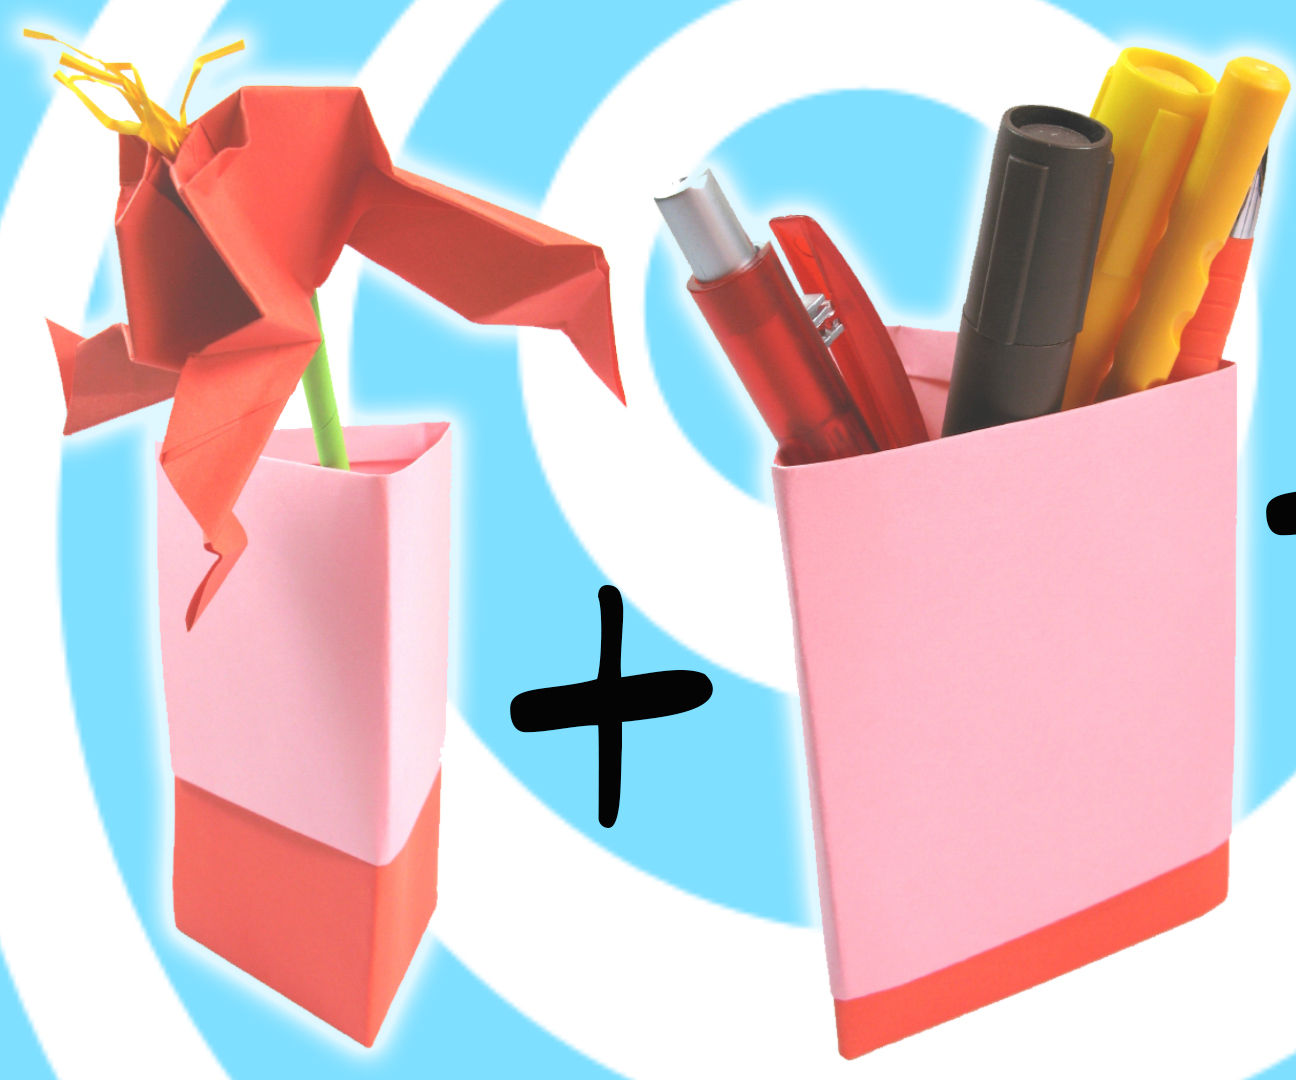 Origami Vase, Pen Holder and Gift Box (3 models in 1 tutorial)